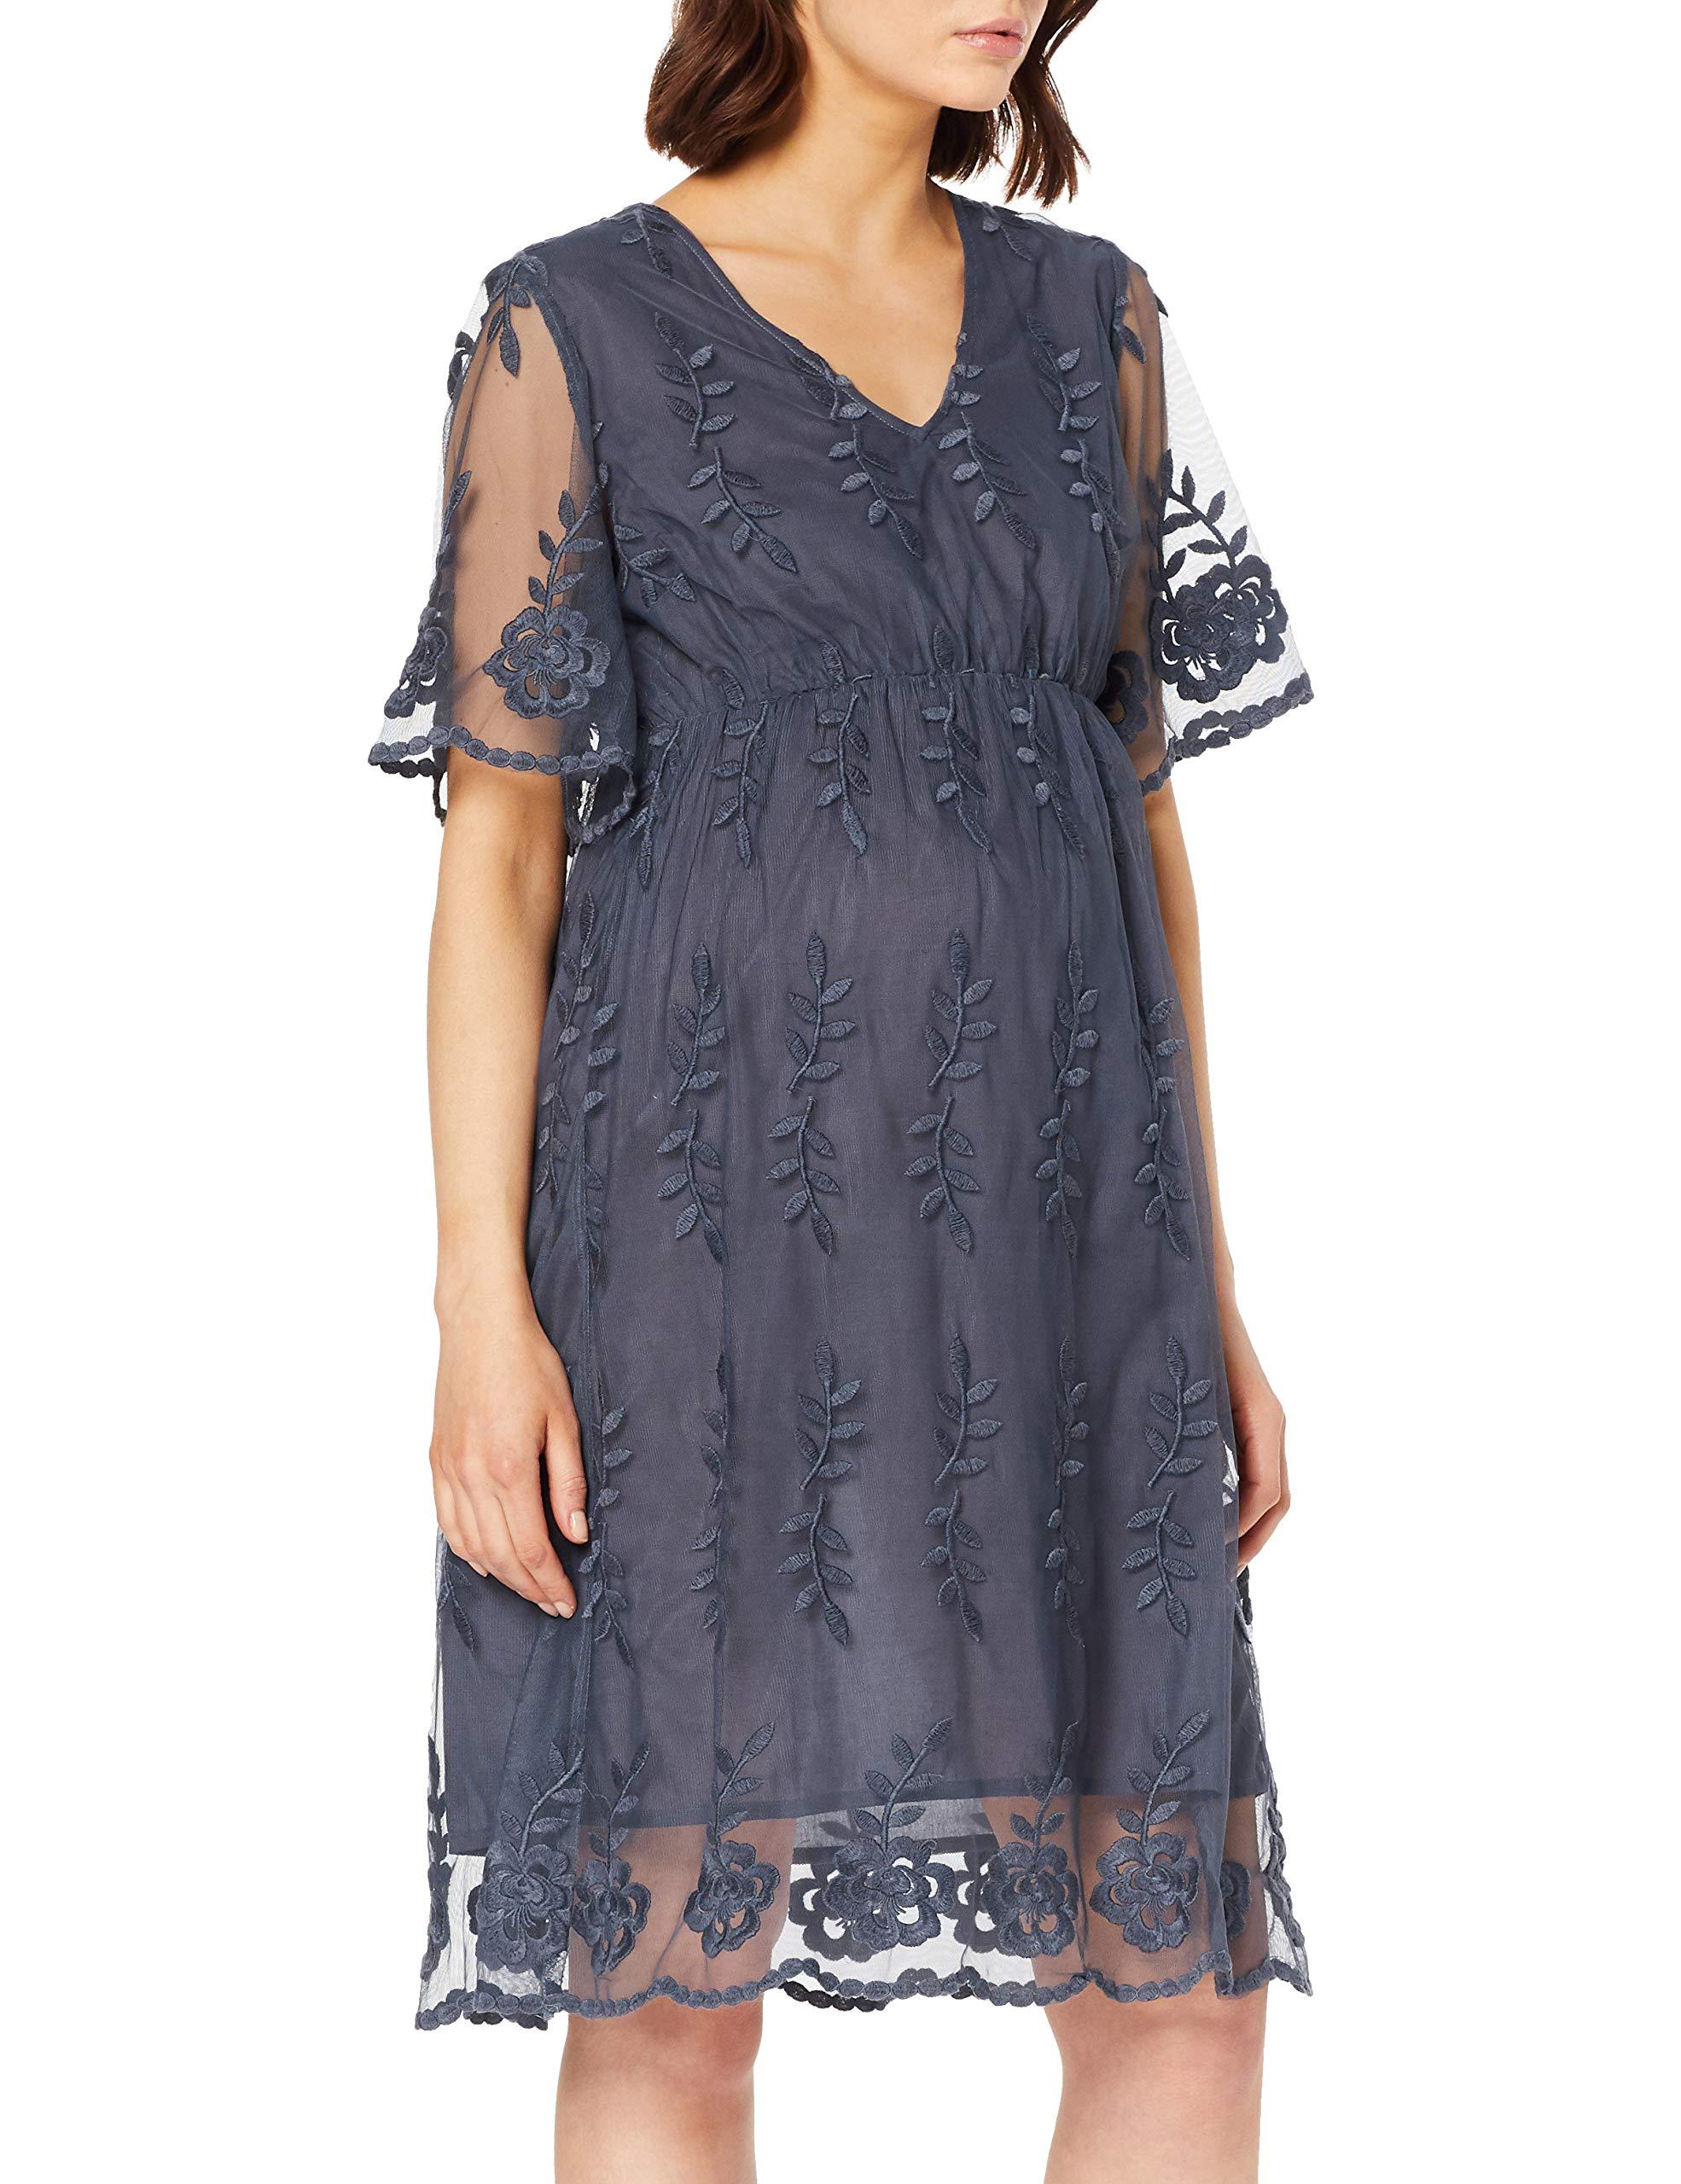 FabricantLargeFemme RobeBleu Woven Mamalicious Blue42taille Dress Mlanja 2 4 Ombre Abk N80wnOPkZX